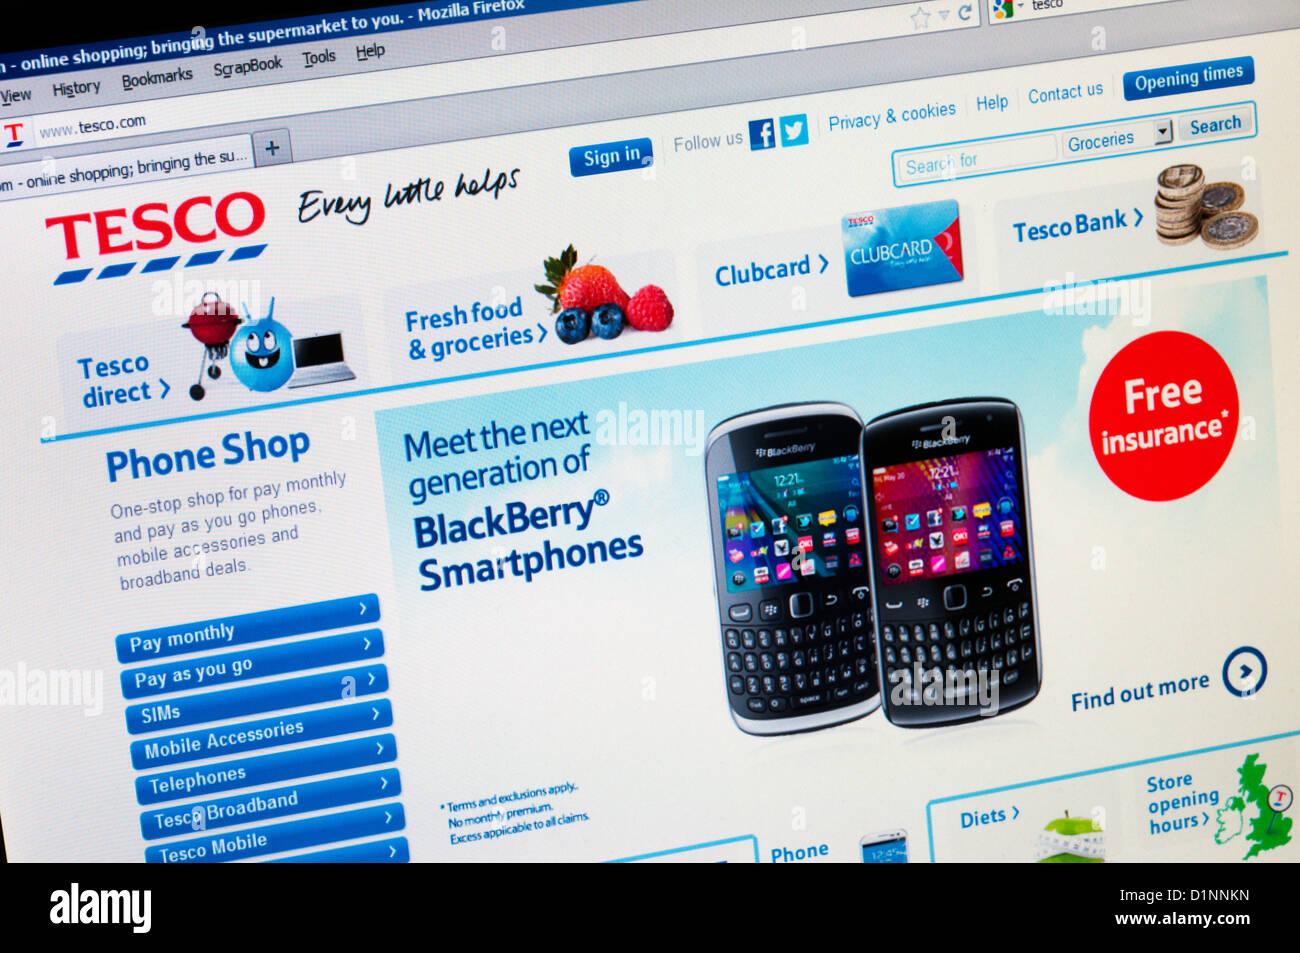 The Tesco web site featuring BlackBerry Smartphones Stock Photo